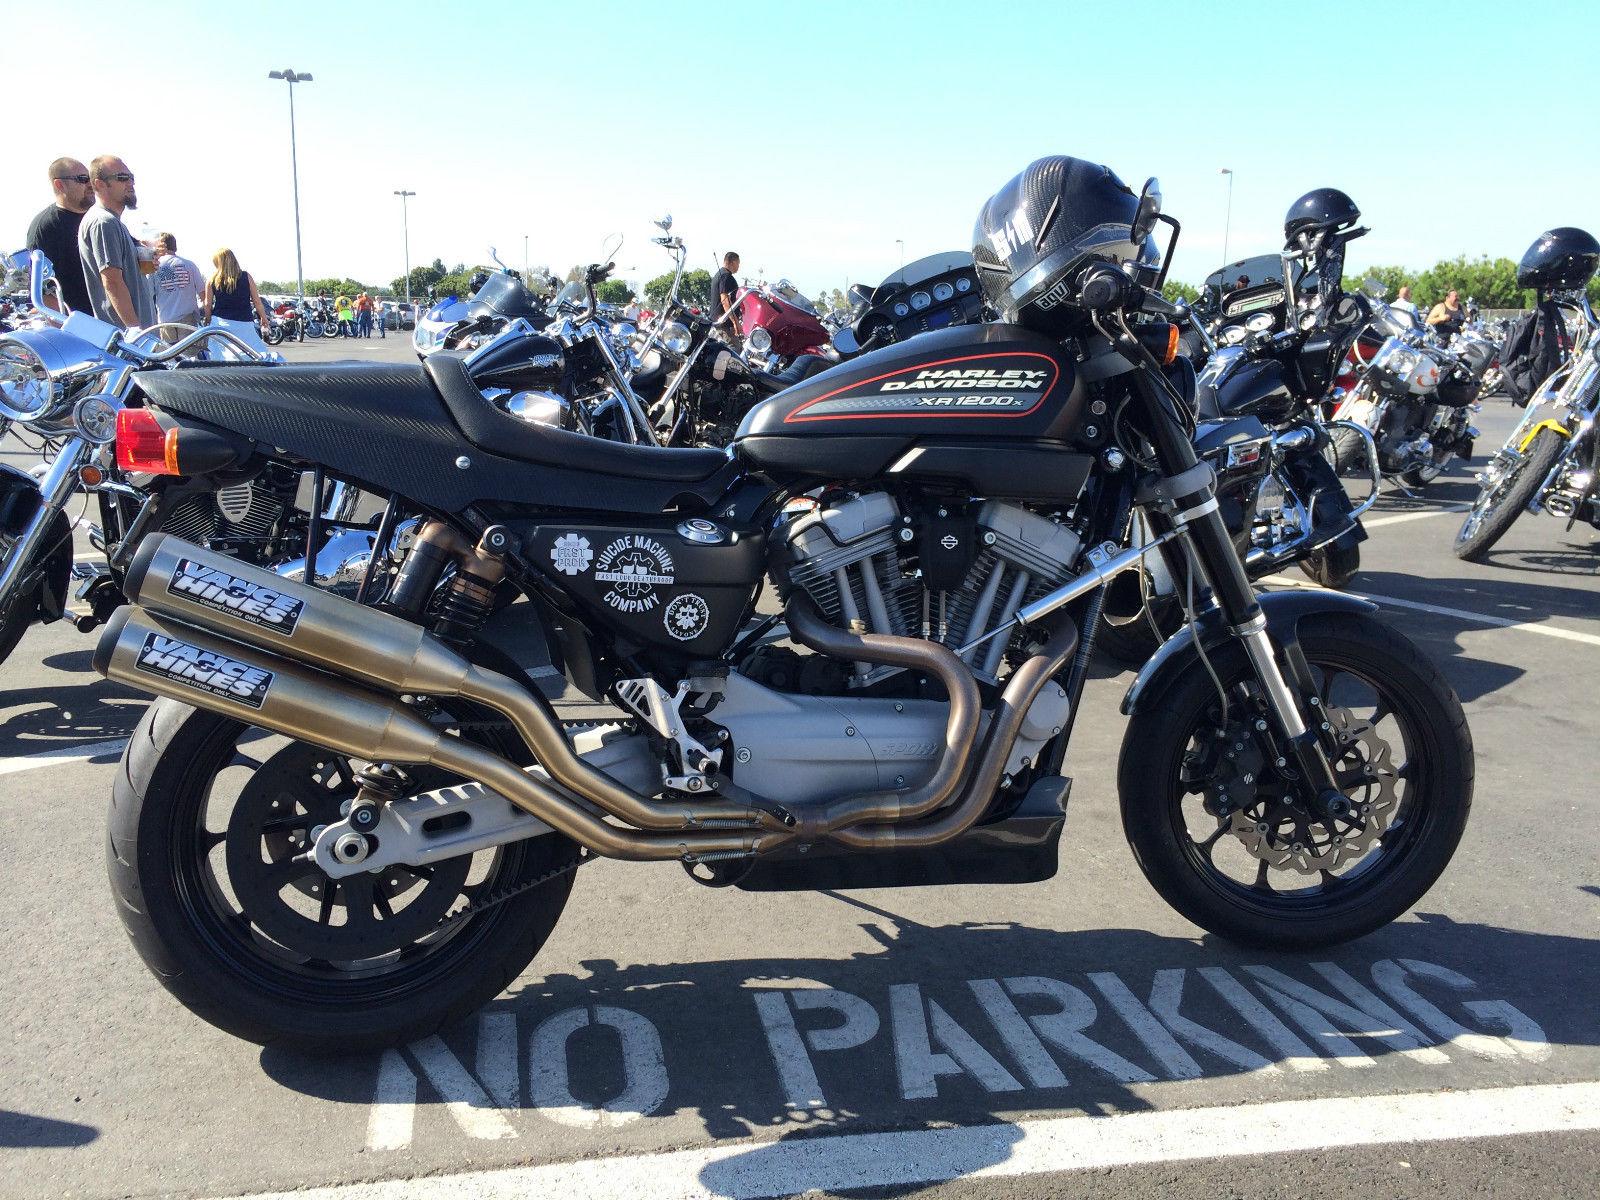 2010 Harley Davidson XR 1200 Vance Hines Race Exhaust Progressive Carbon  Fiber